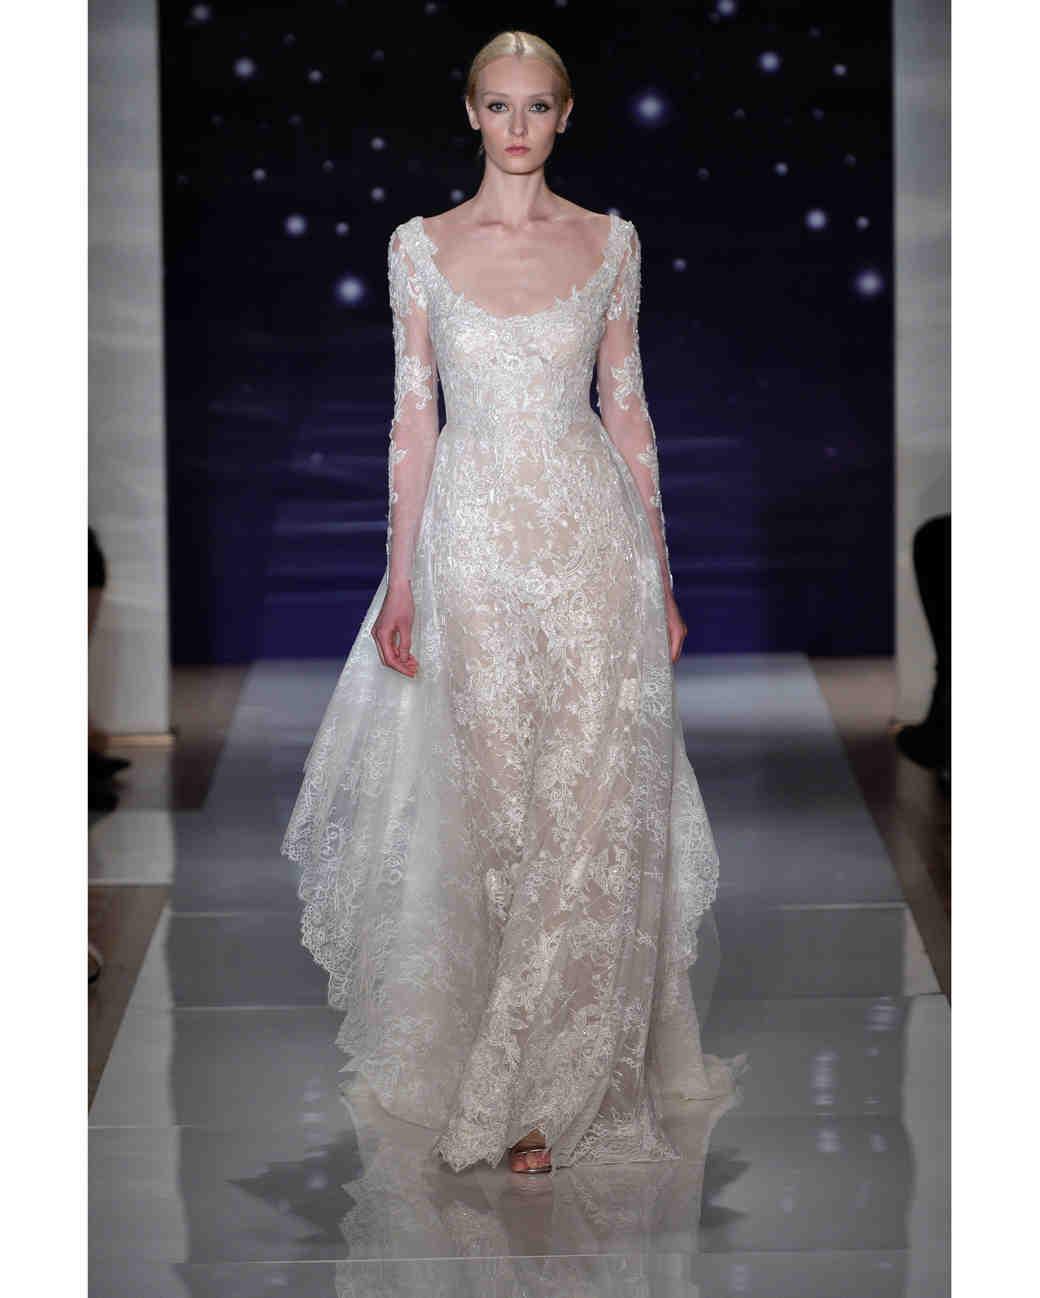 50-states-wedding-dresses-vermont-reem-acra-0615.jpg